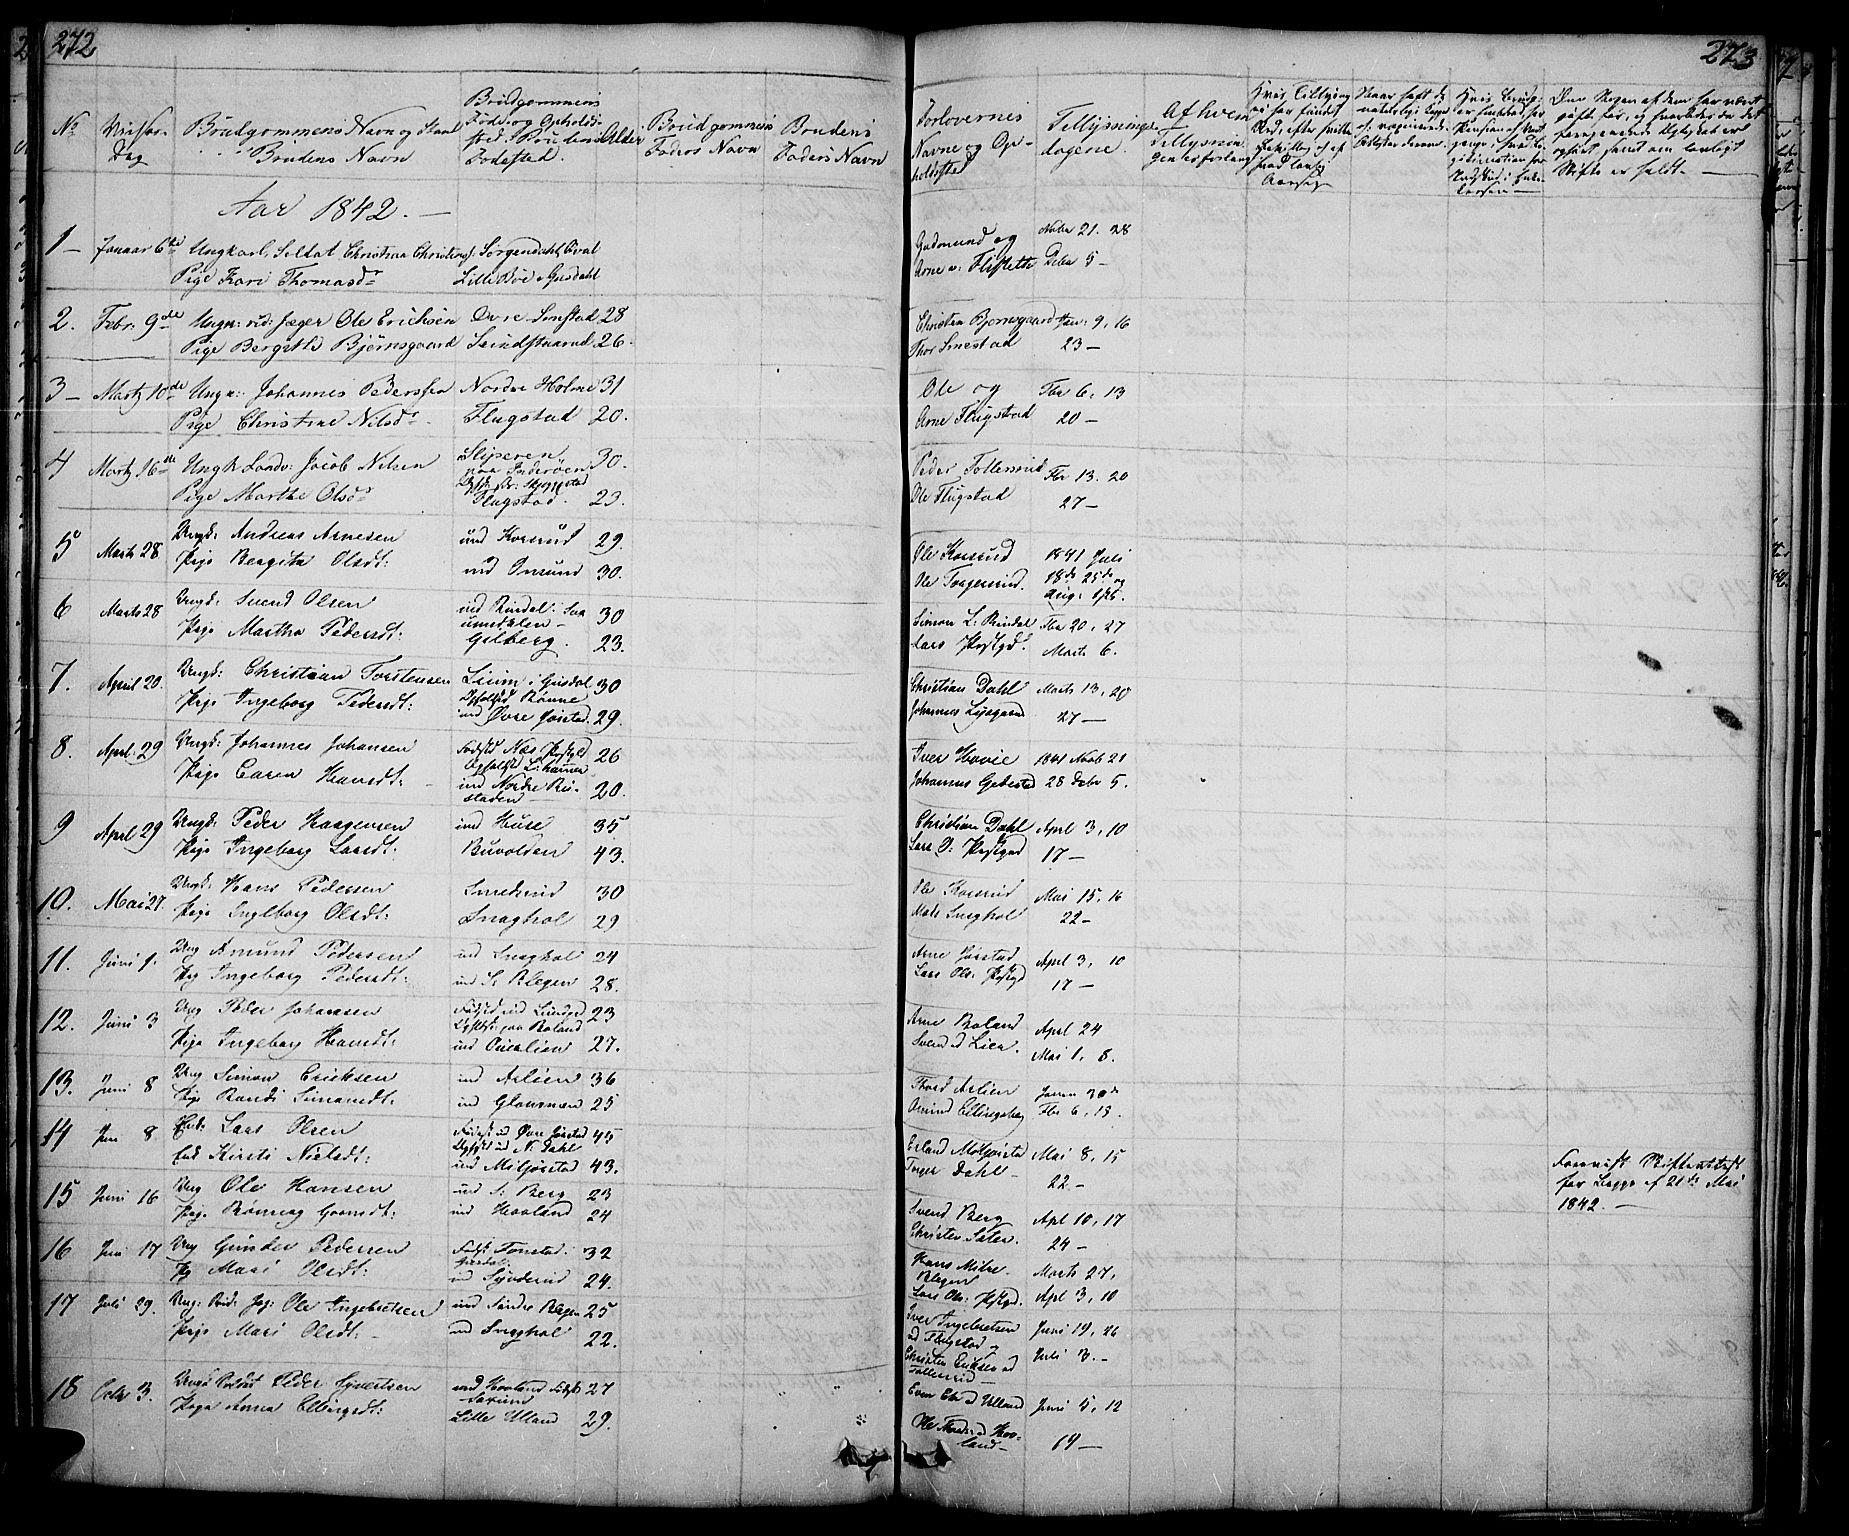 SAH, Fåberg prestekontor, Klokkerbok nr. 5, 1837-1864, s. 272-273